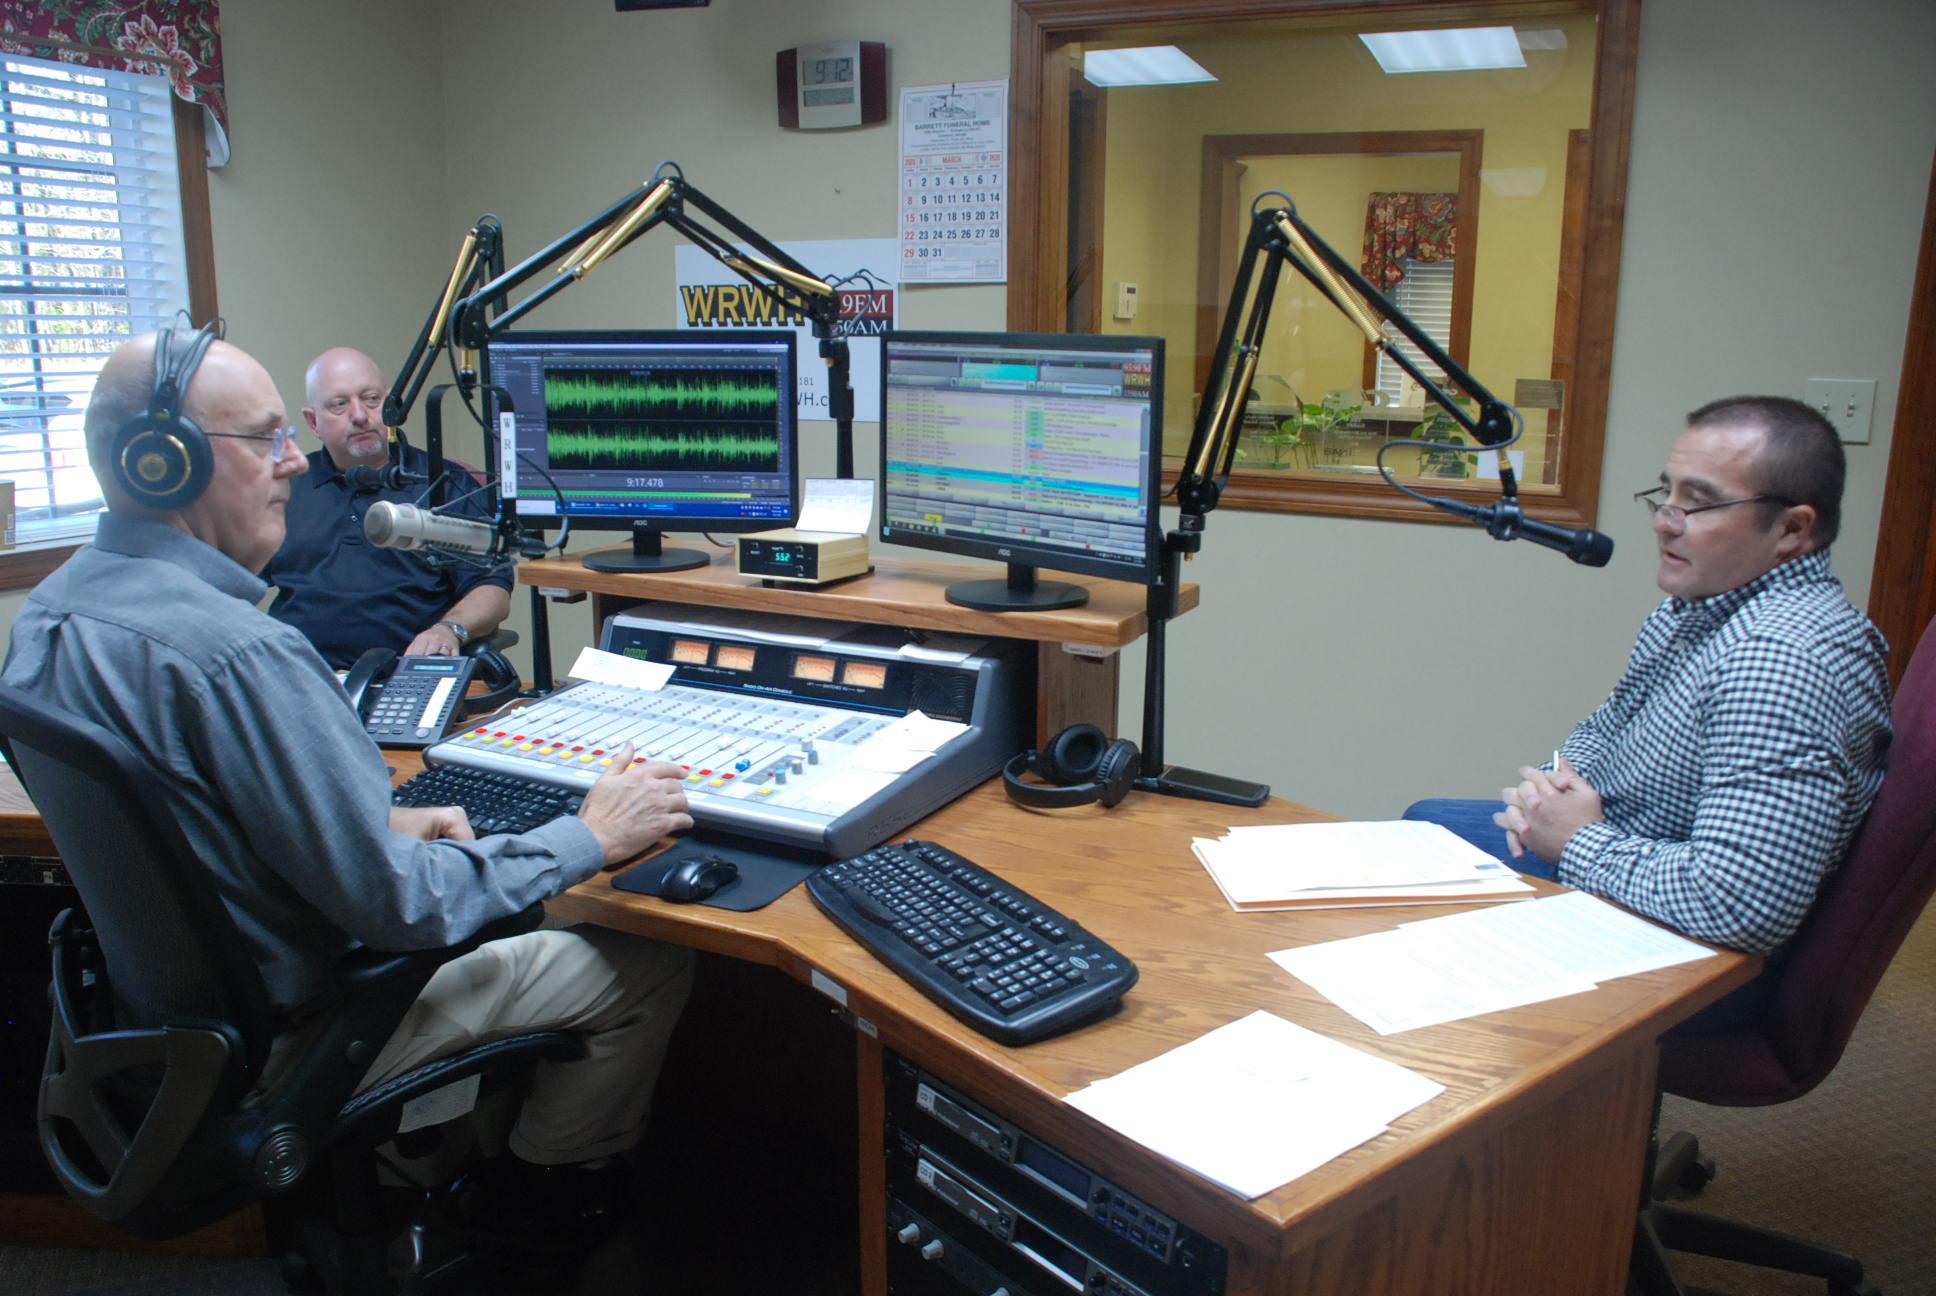 Corona Virus Outbreak Update with Travis Turner and David Murphy